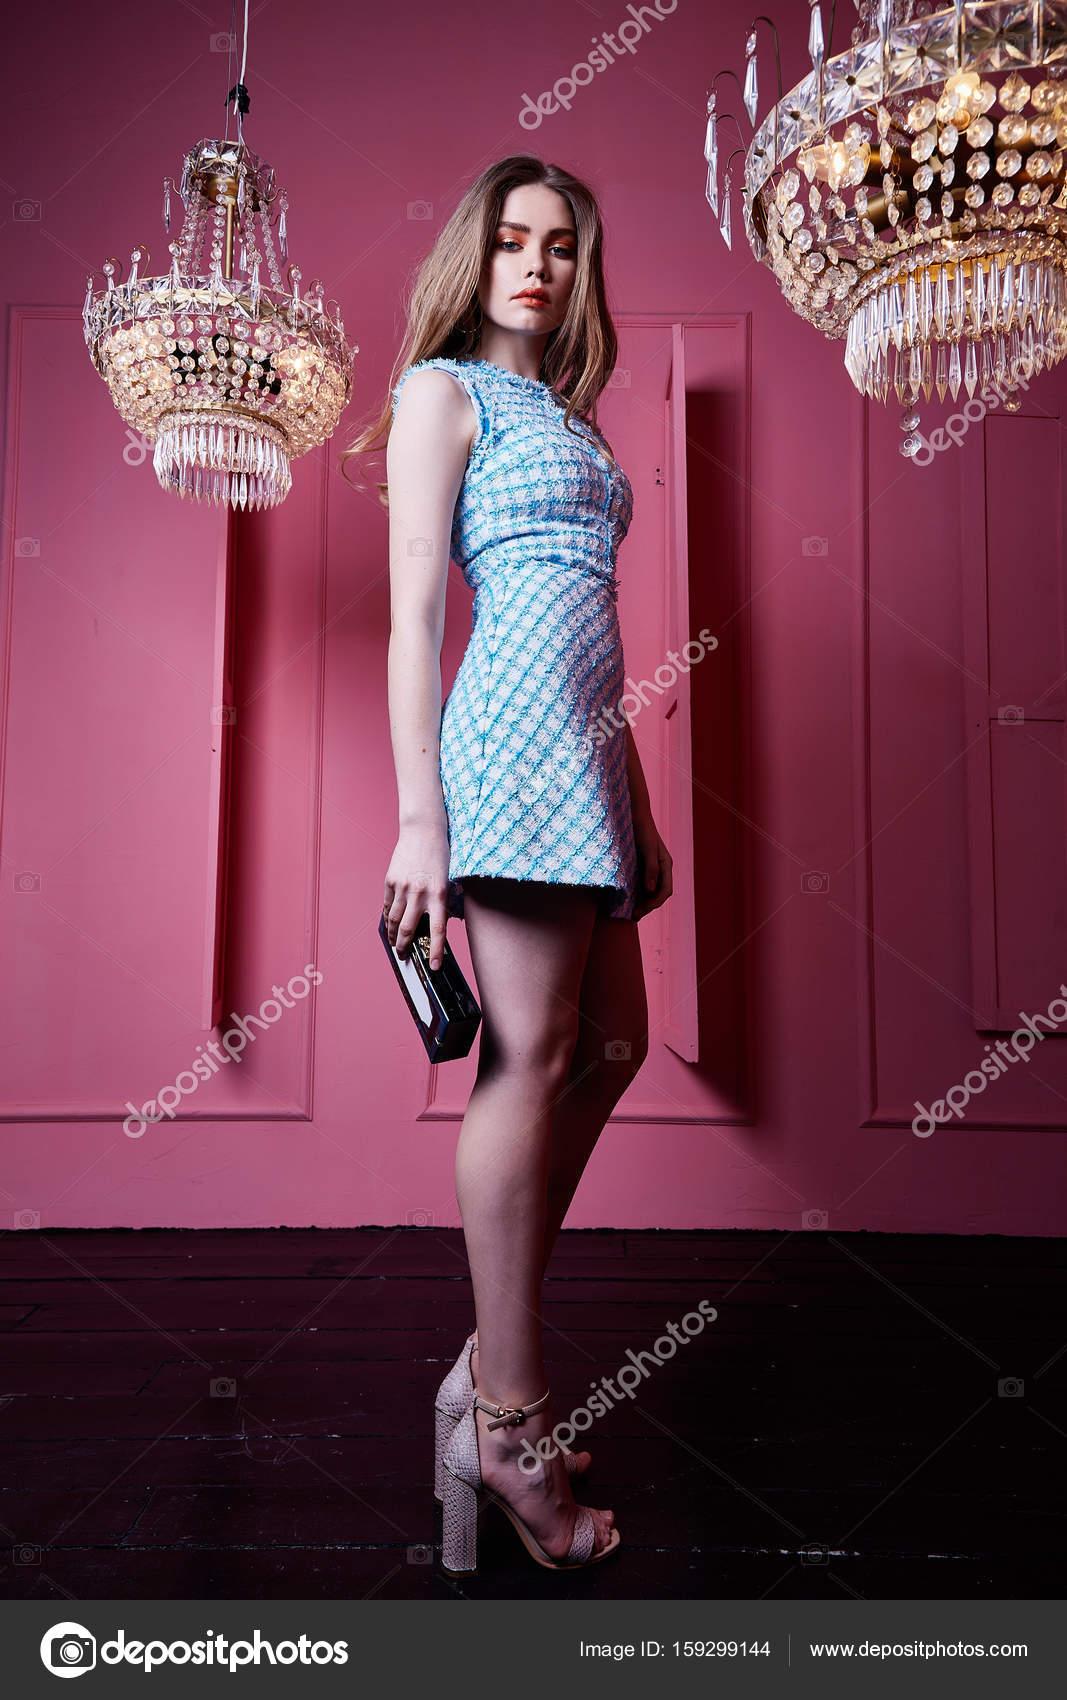 Cara bonita hermosa sexy mujer rubia chica dama moda modelo w ...